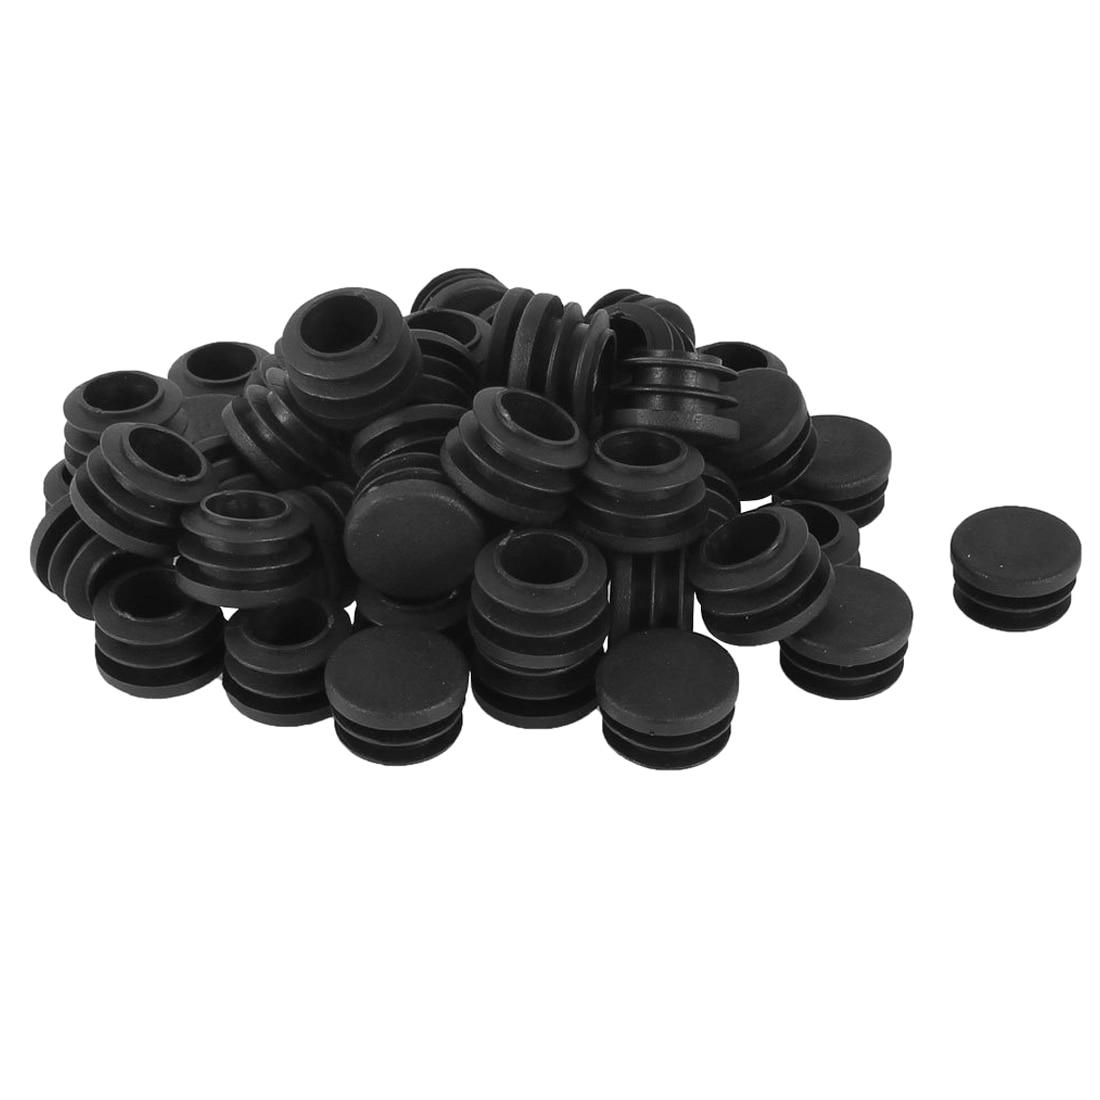 Wholesale 50 Pcs Black Plastic Furniture Leg Plug Blanking End Caps Insert Plugs Bung For Round Pipe Tube 22mm Dia